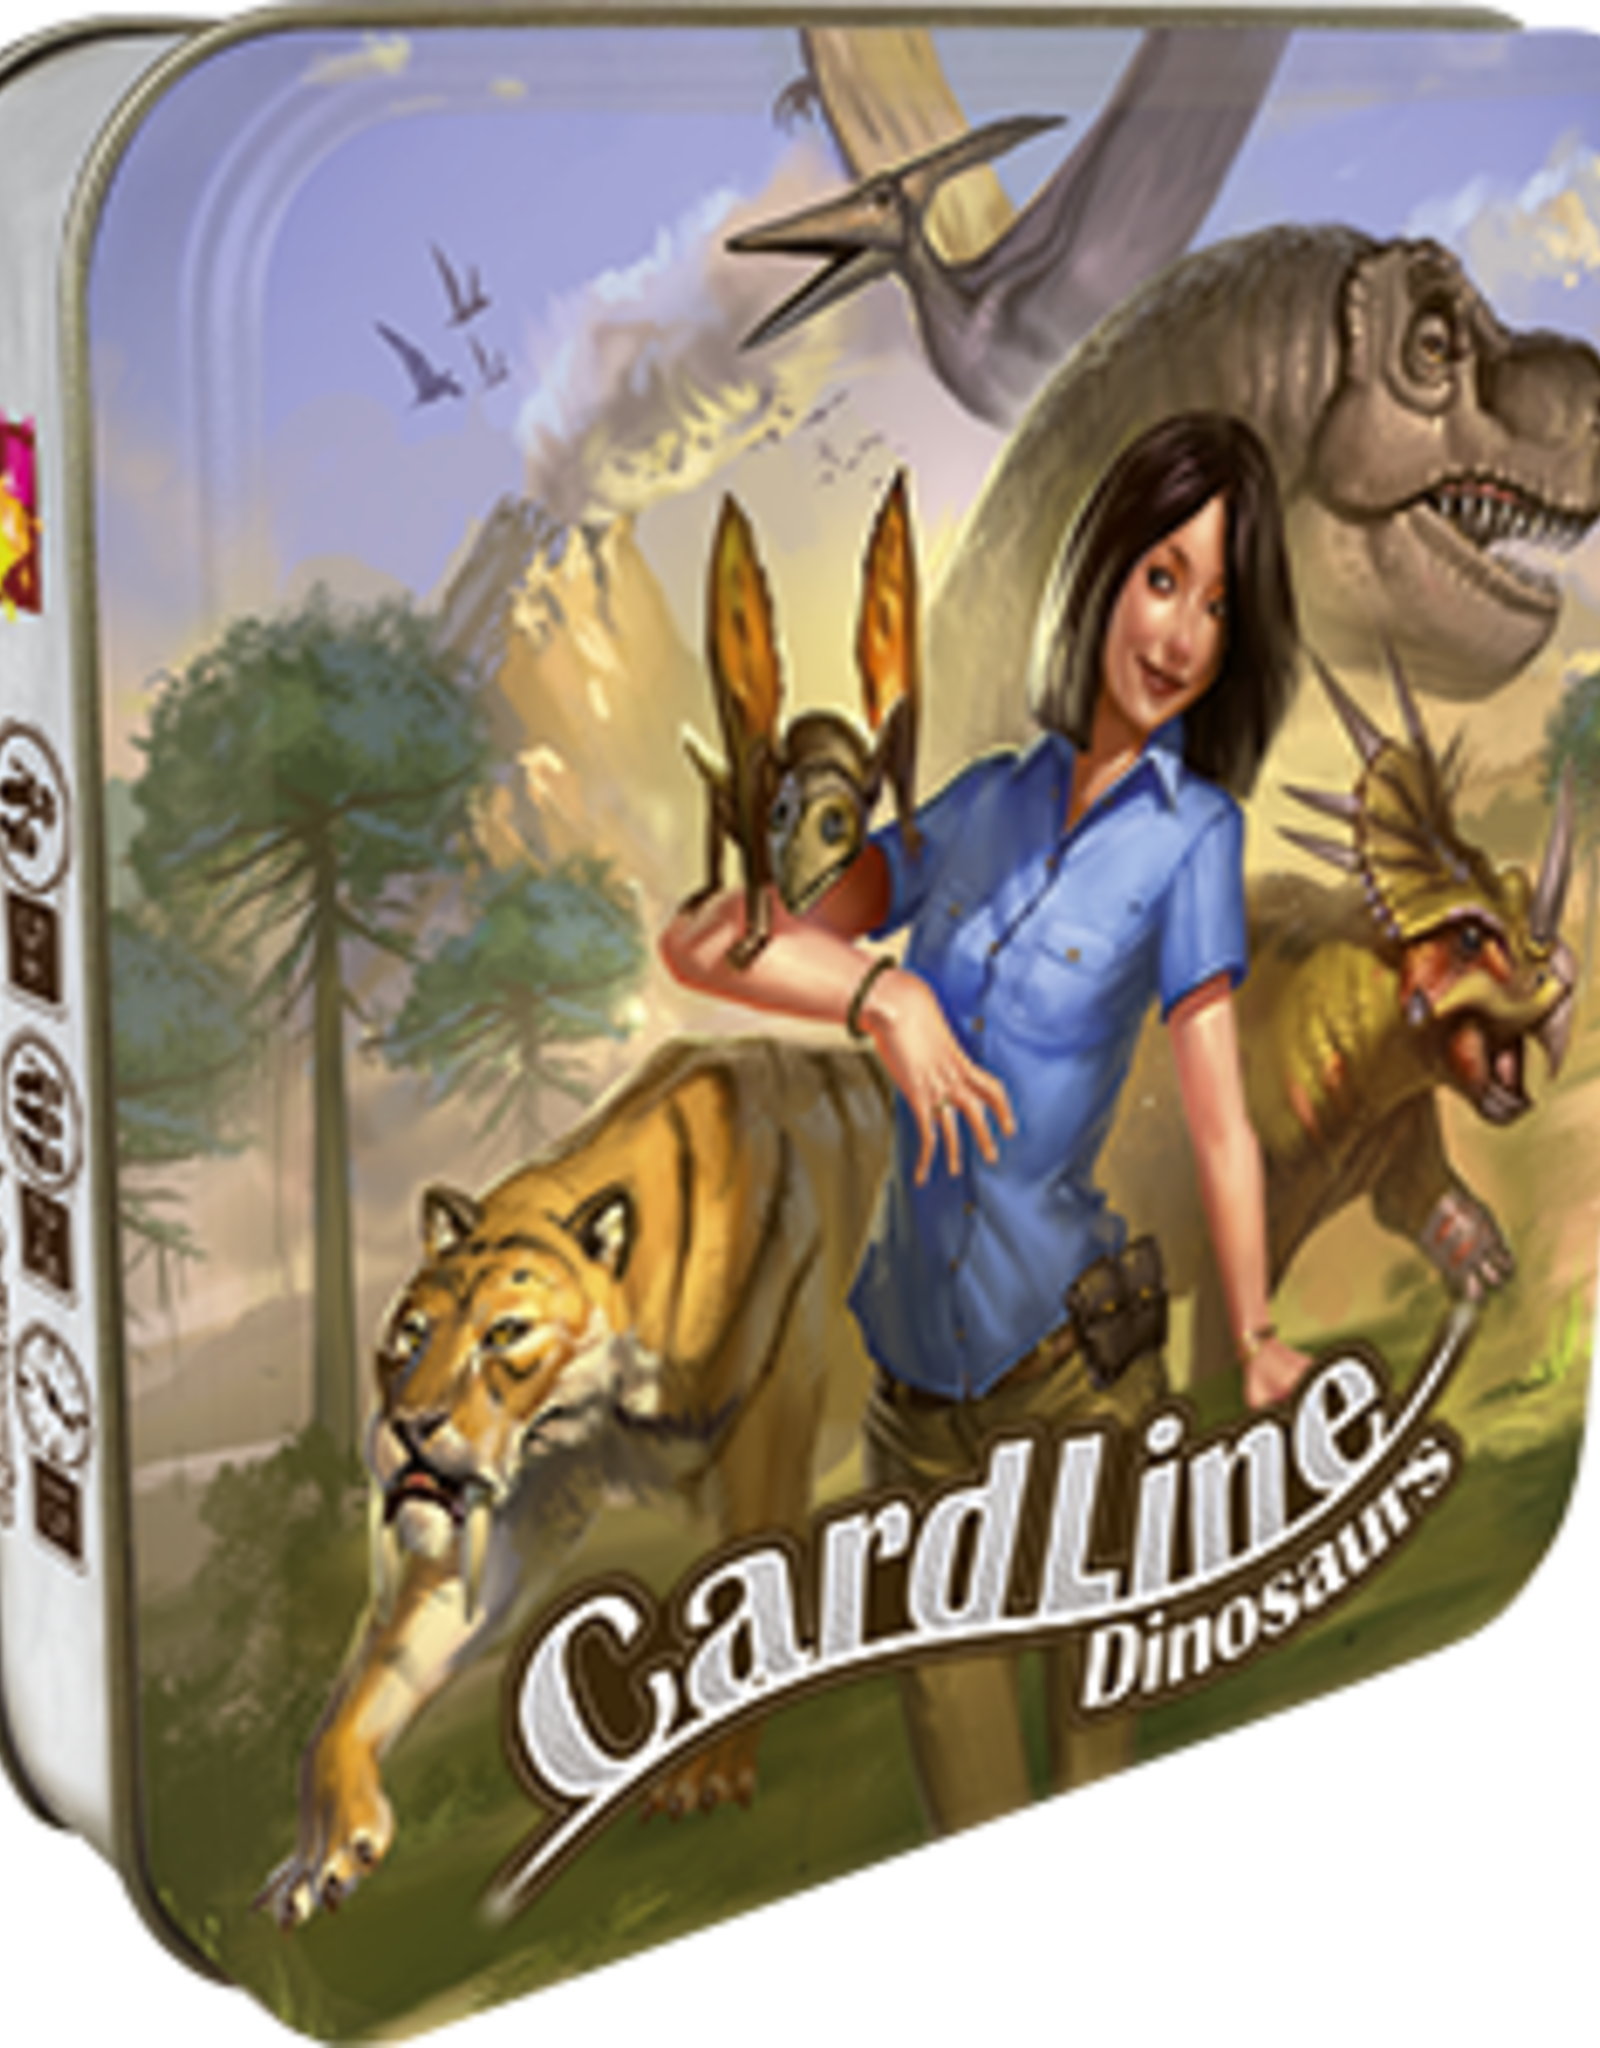 Asmodee Cardline: Dinosaur